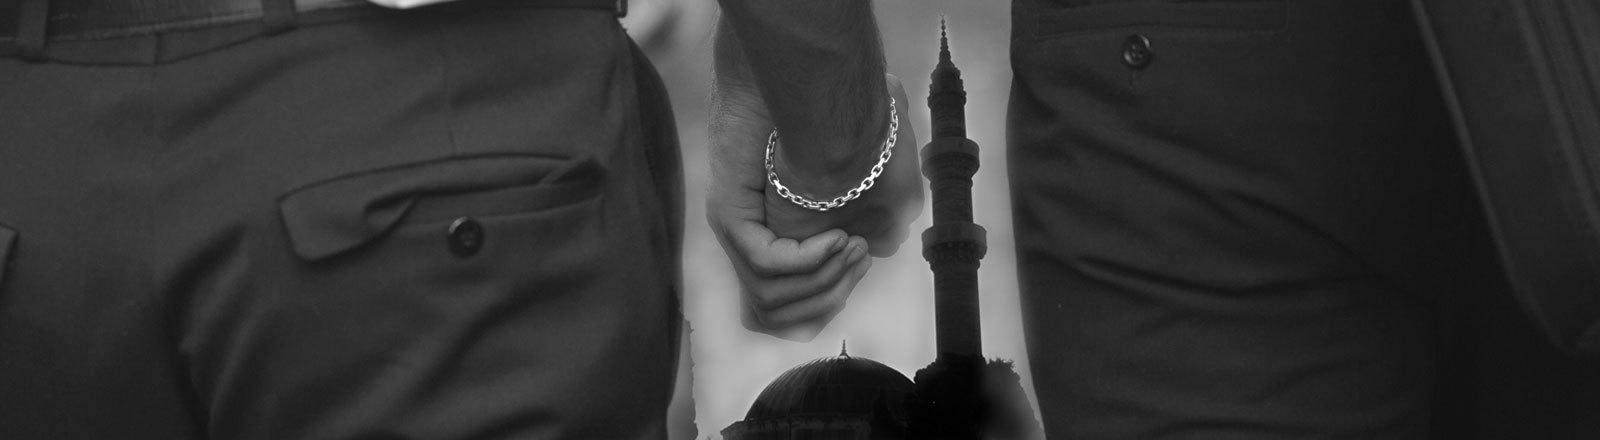 Schwule Homosexualität Islam